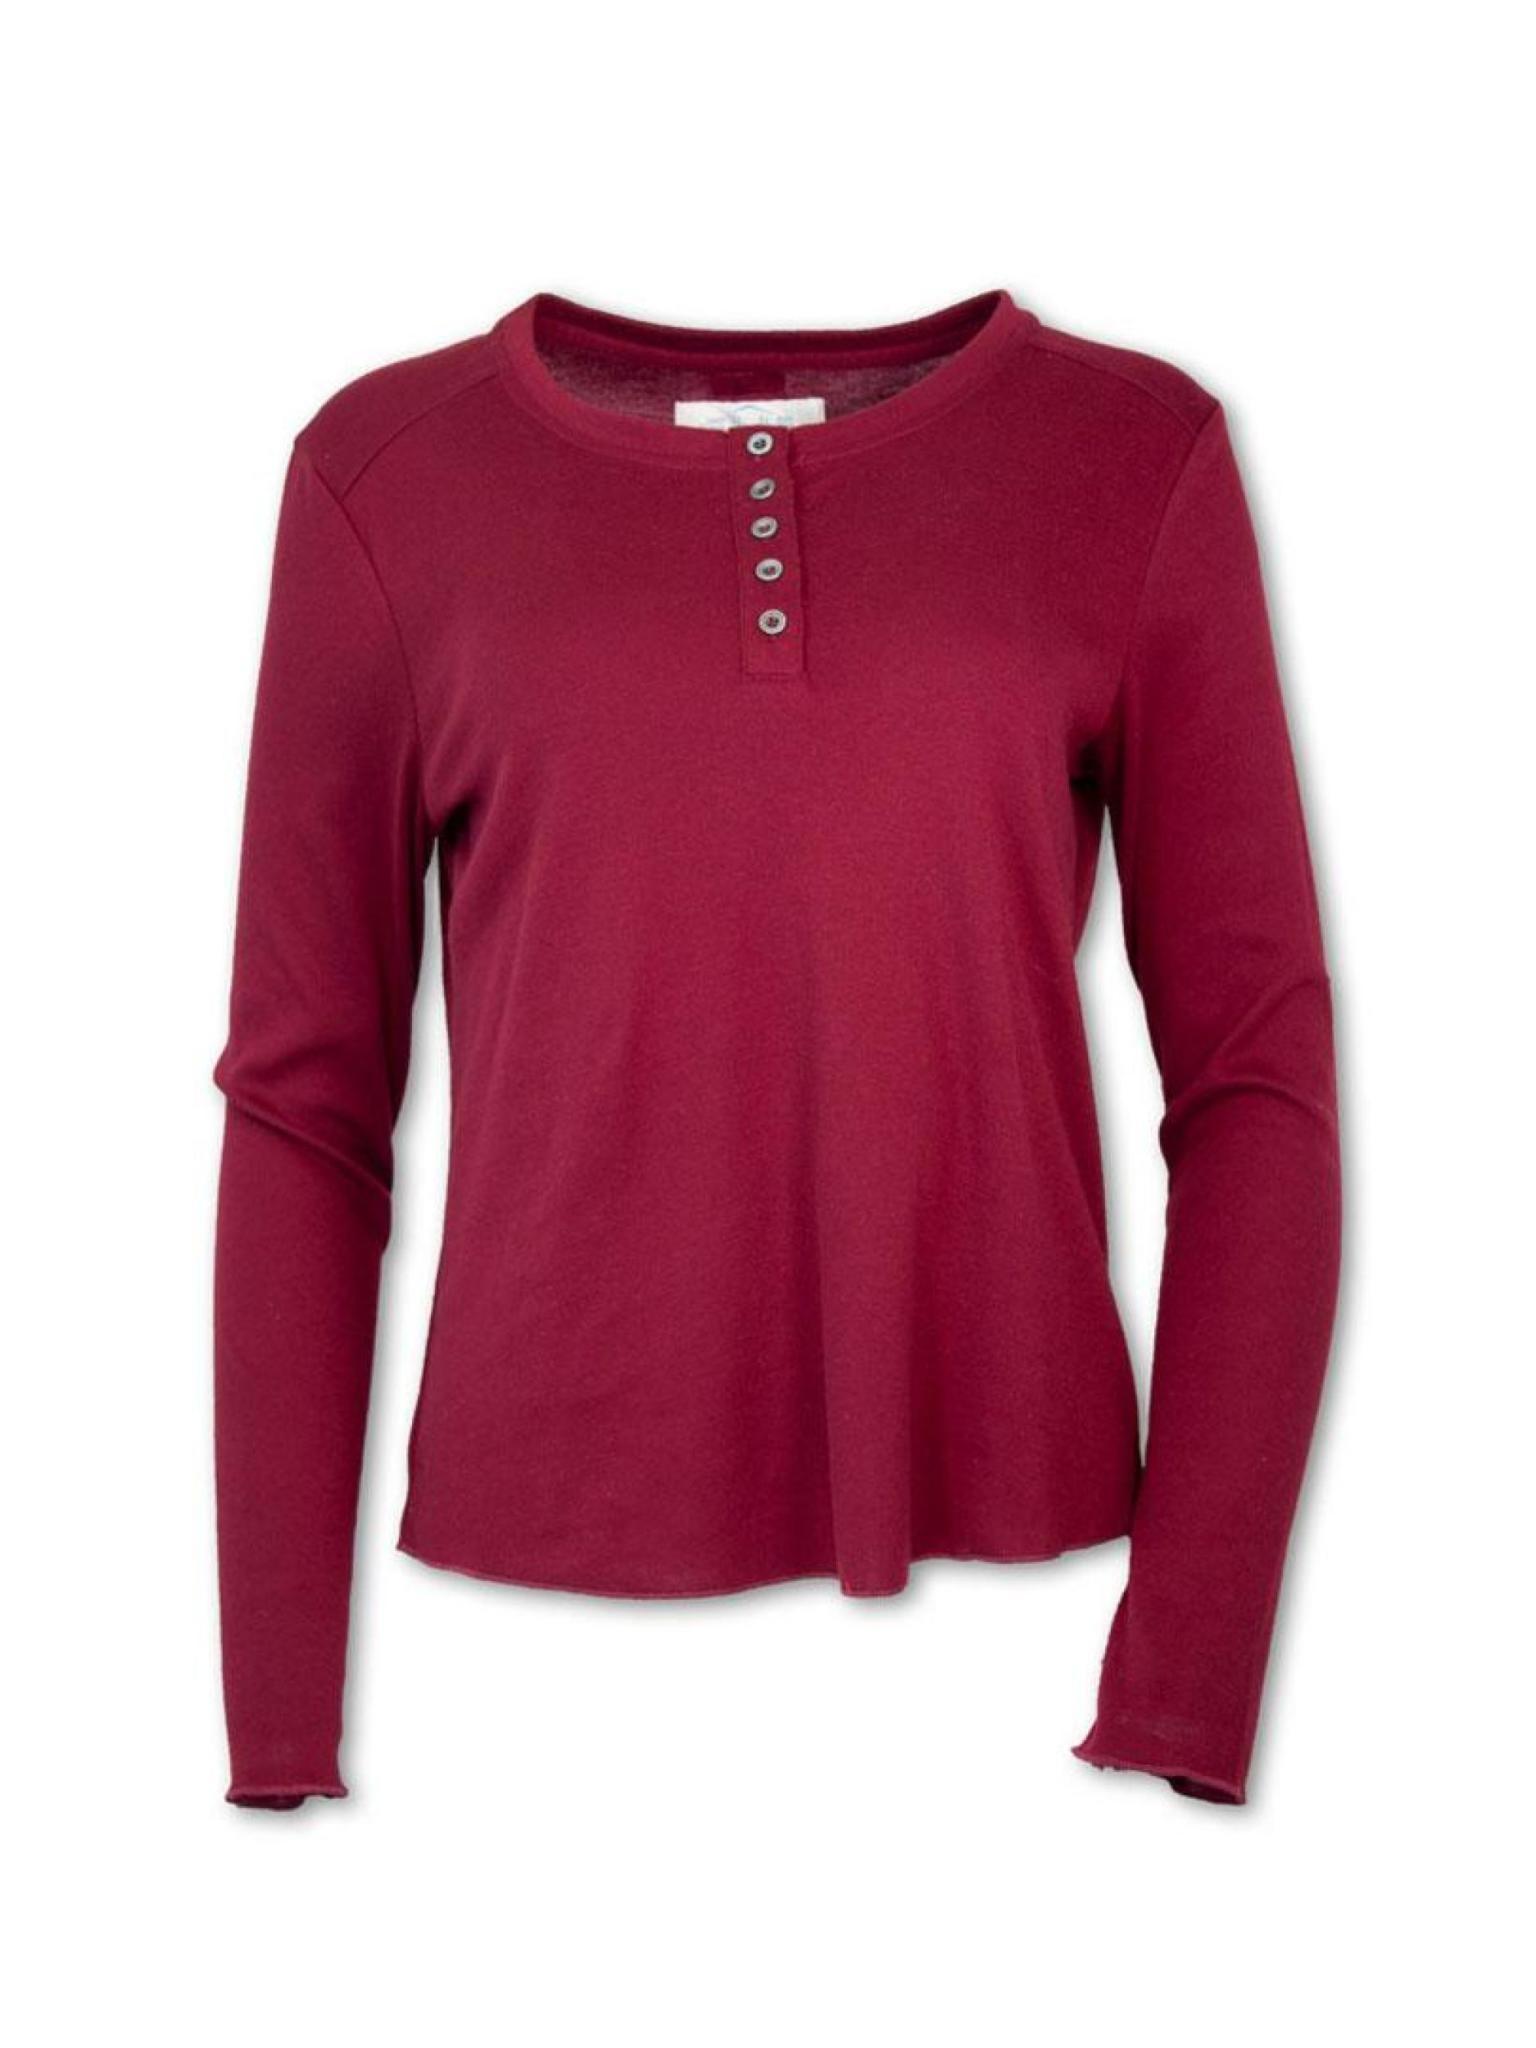 Purnell Women's Long Sleeve Henley